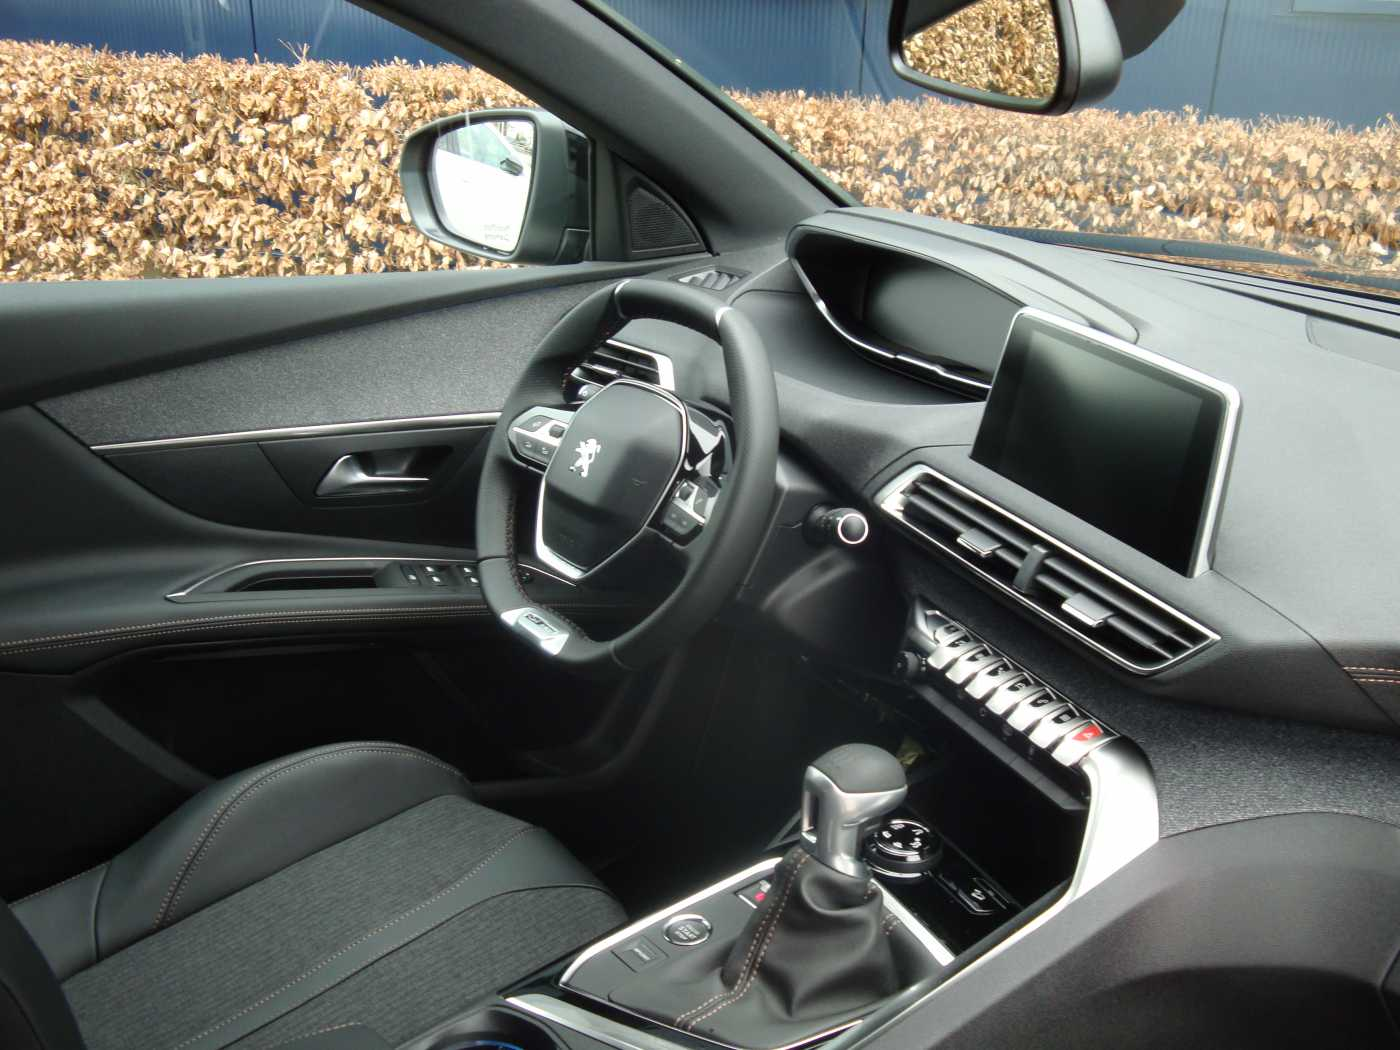 Peugeot 3008 1.5 BlueHDi (EU6.2) 2/13